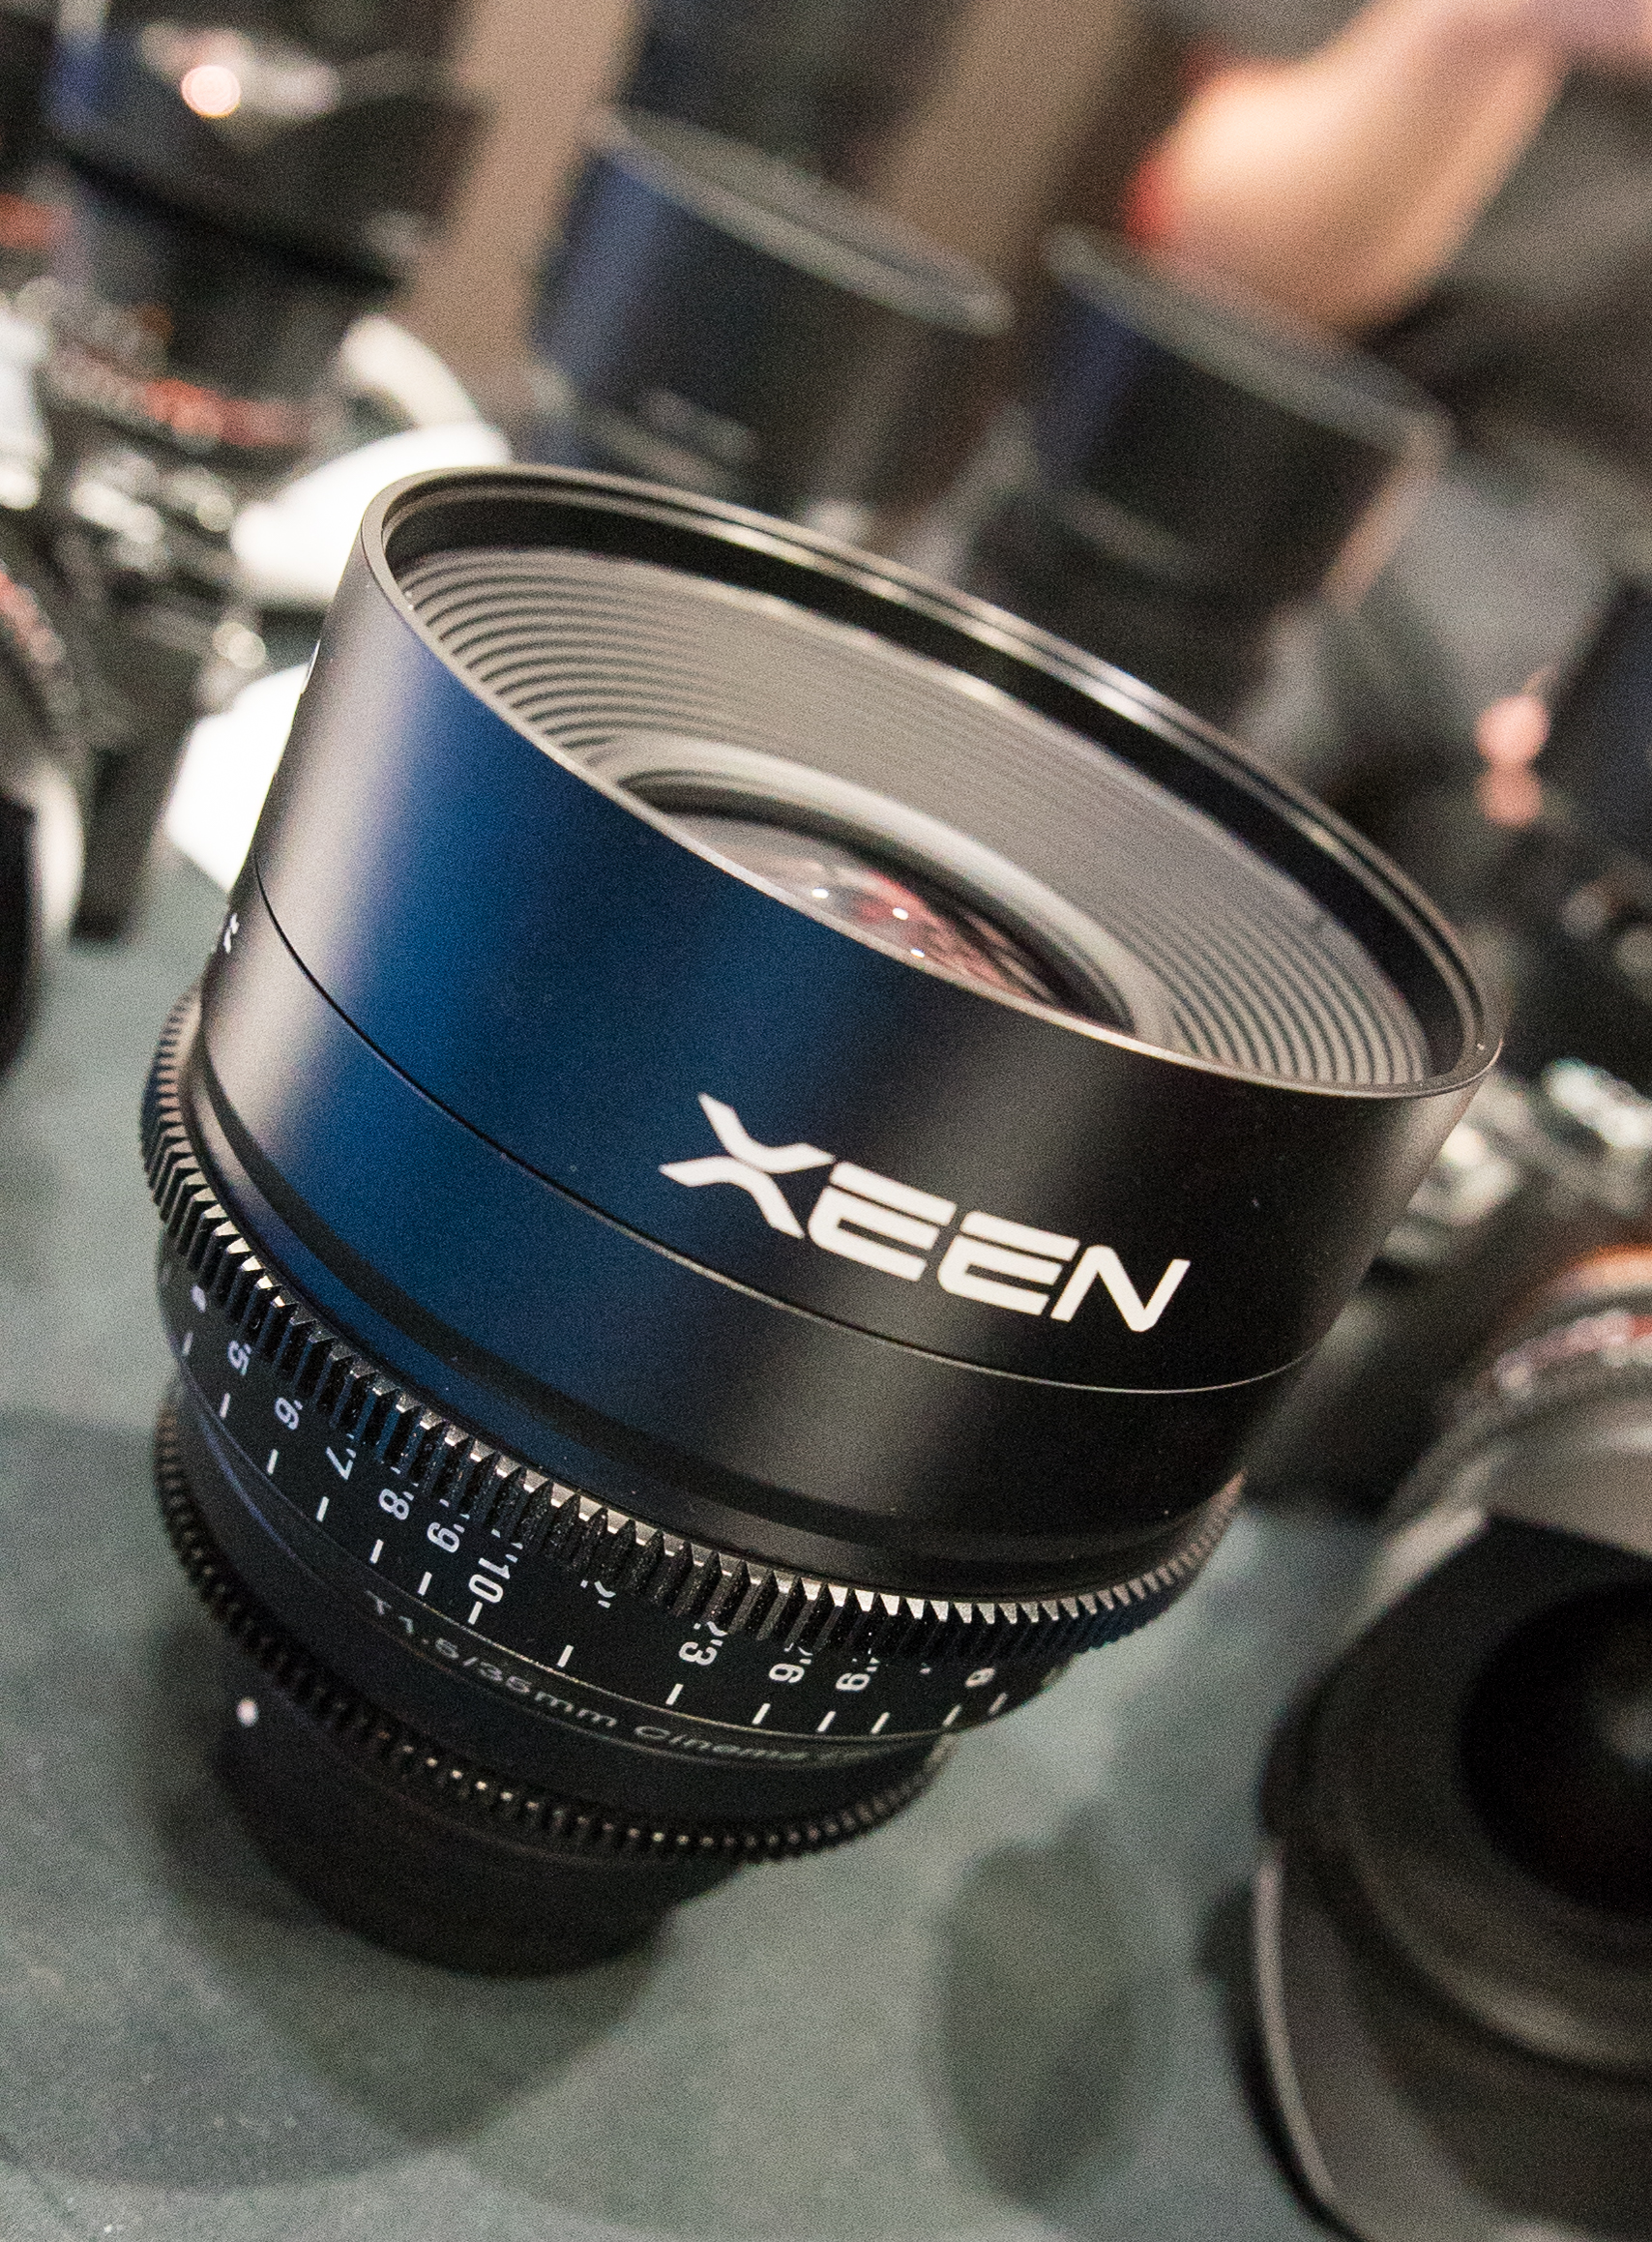 Samyang XEEN cine lenses BVE 2016 Adam Plowden Video Cinema5D